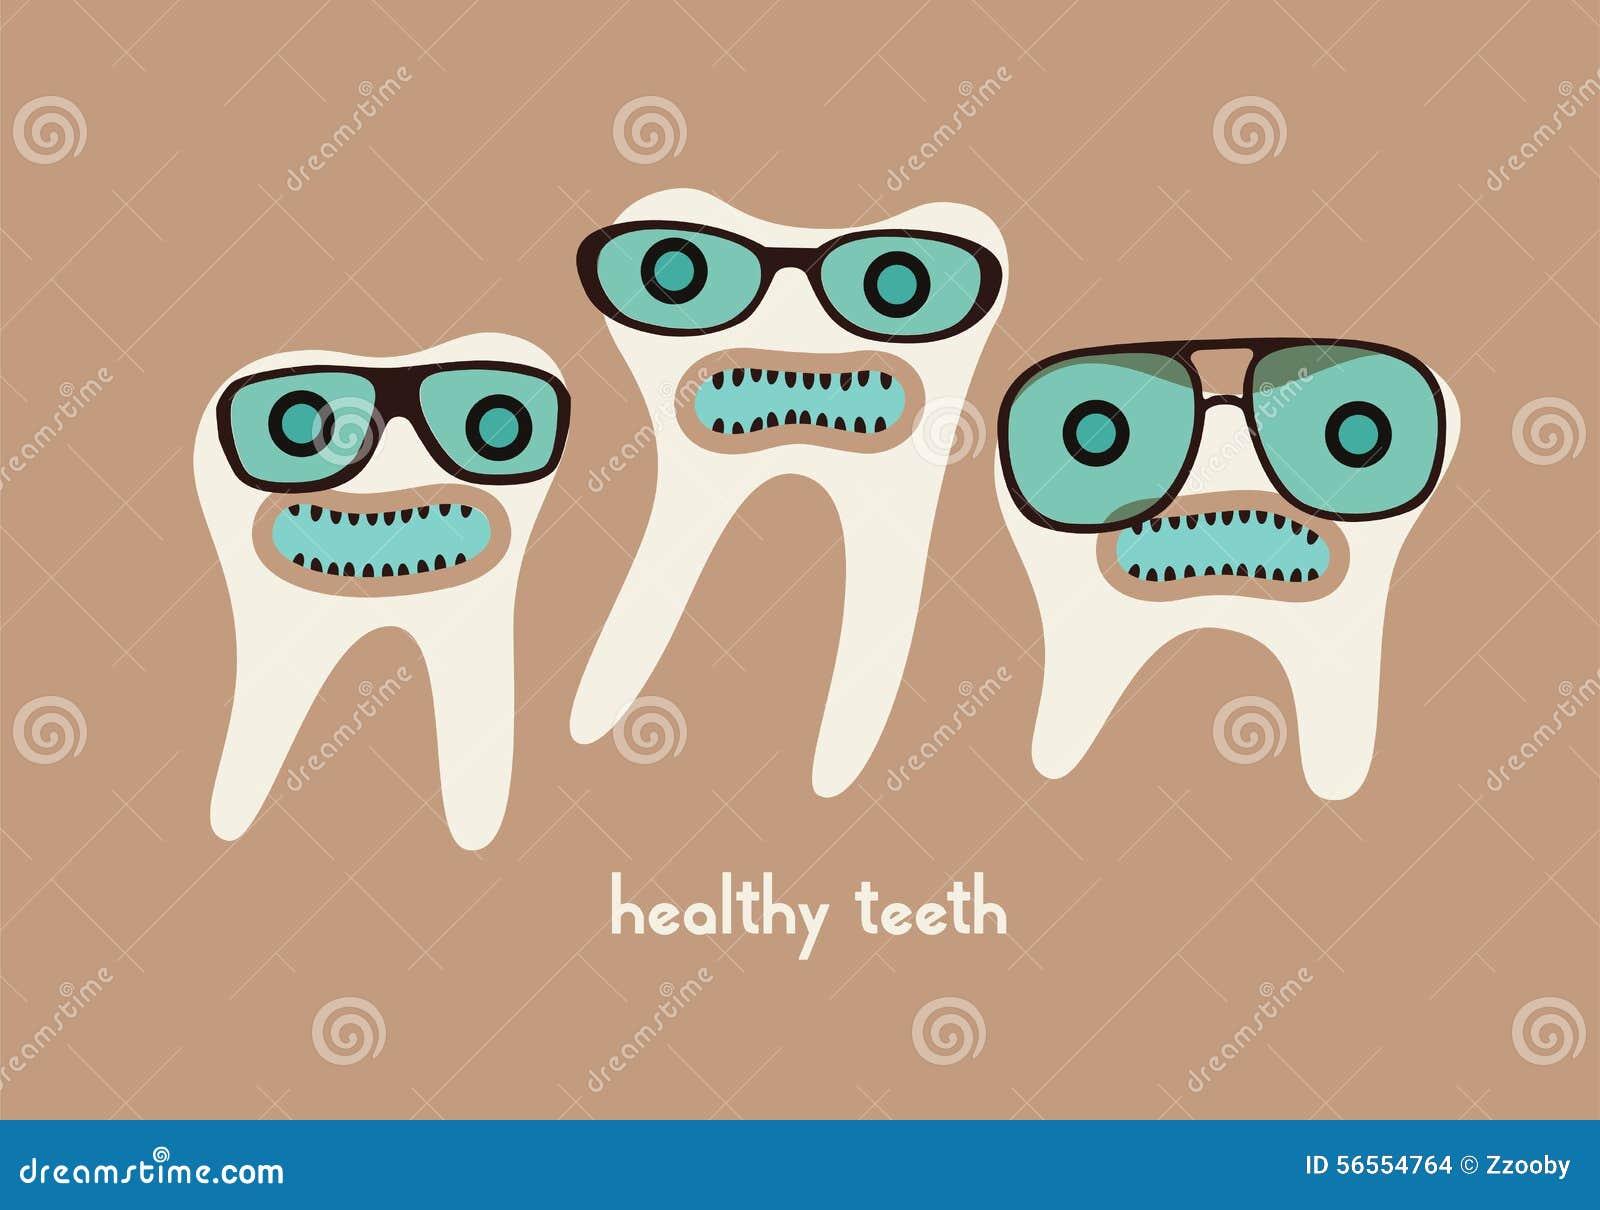 Download Αστείοι χαρακτήρες κινουμένων σχεδίων δοντιών στα γυαλιά επίσης Corel σύρετε το διάνυσμα απεικόνισης Διανυσματική απεικόνιση - εικονογραφία από ζούλιγμα, κατσίκια: 56554764